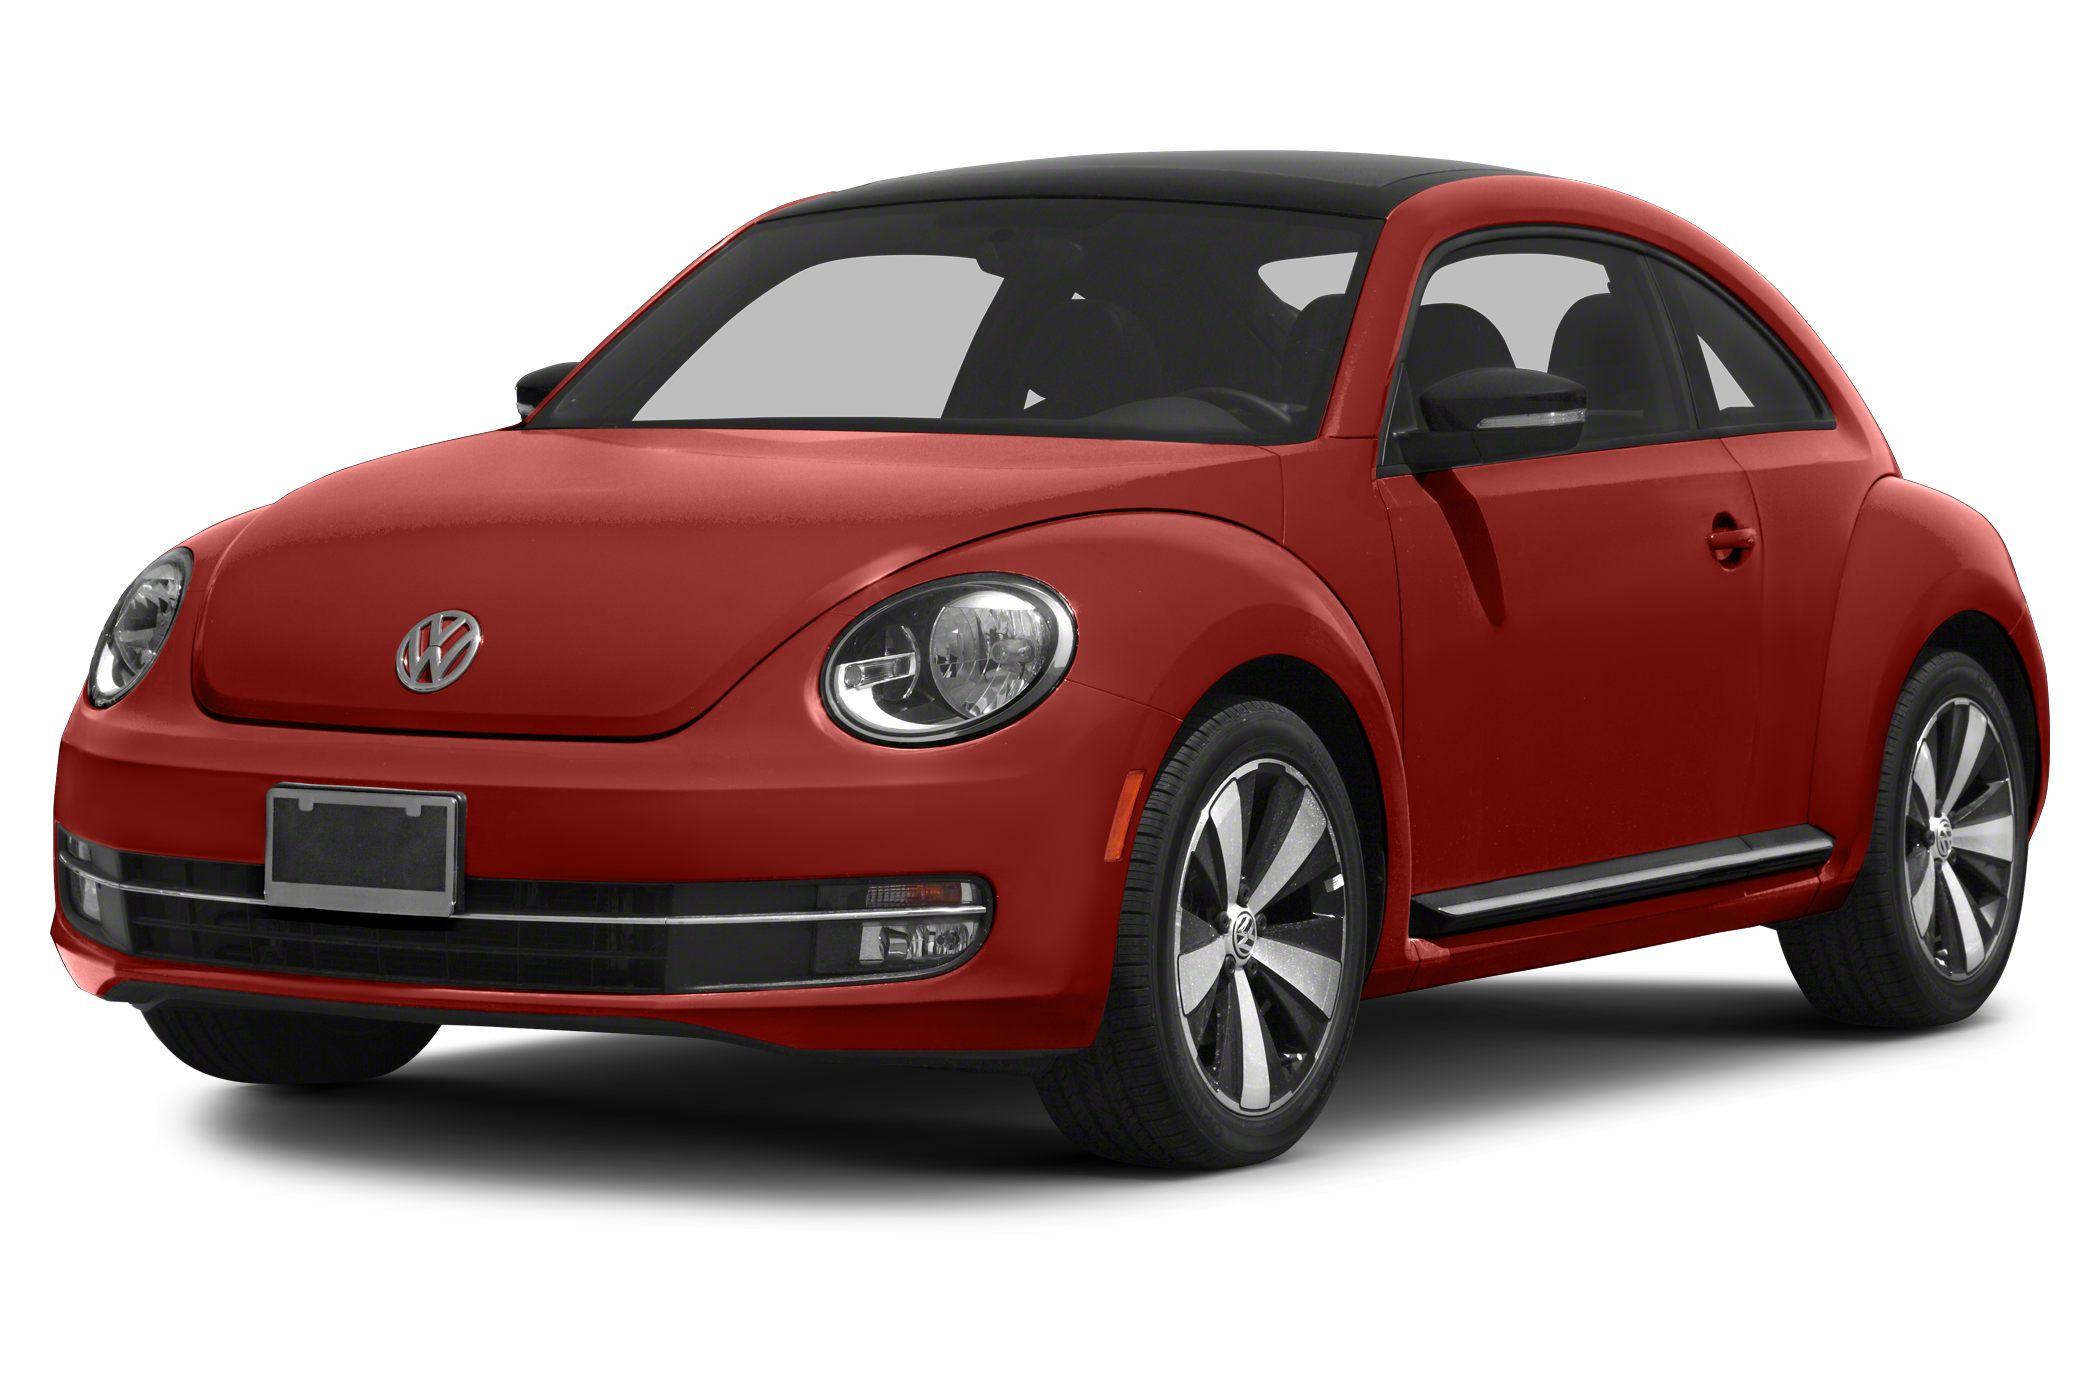 2013 Volkswagen Beetle 20T Turbo SPORT WHEELS BLUETOOTH HEATED SEATS HEATED MIRRORS UPGRADED